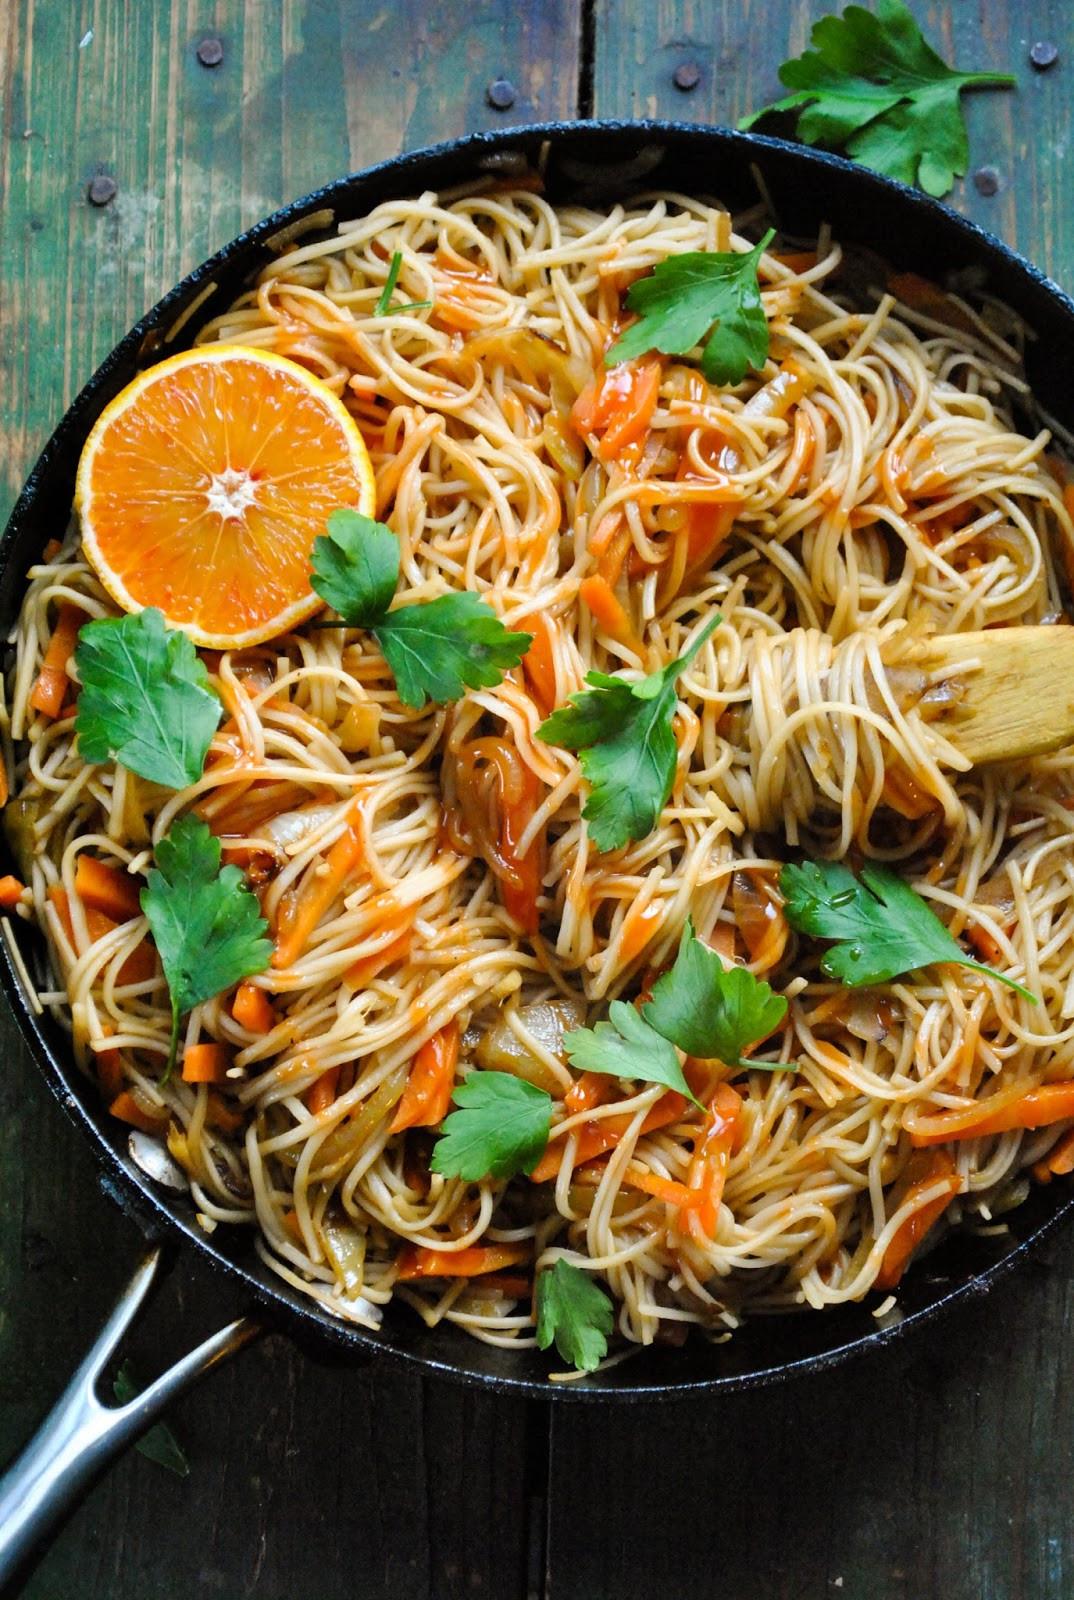 Quick And Easy Vegan Recipes  Quick and easy vegan noodle stir fry VeganSandra